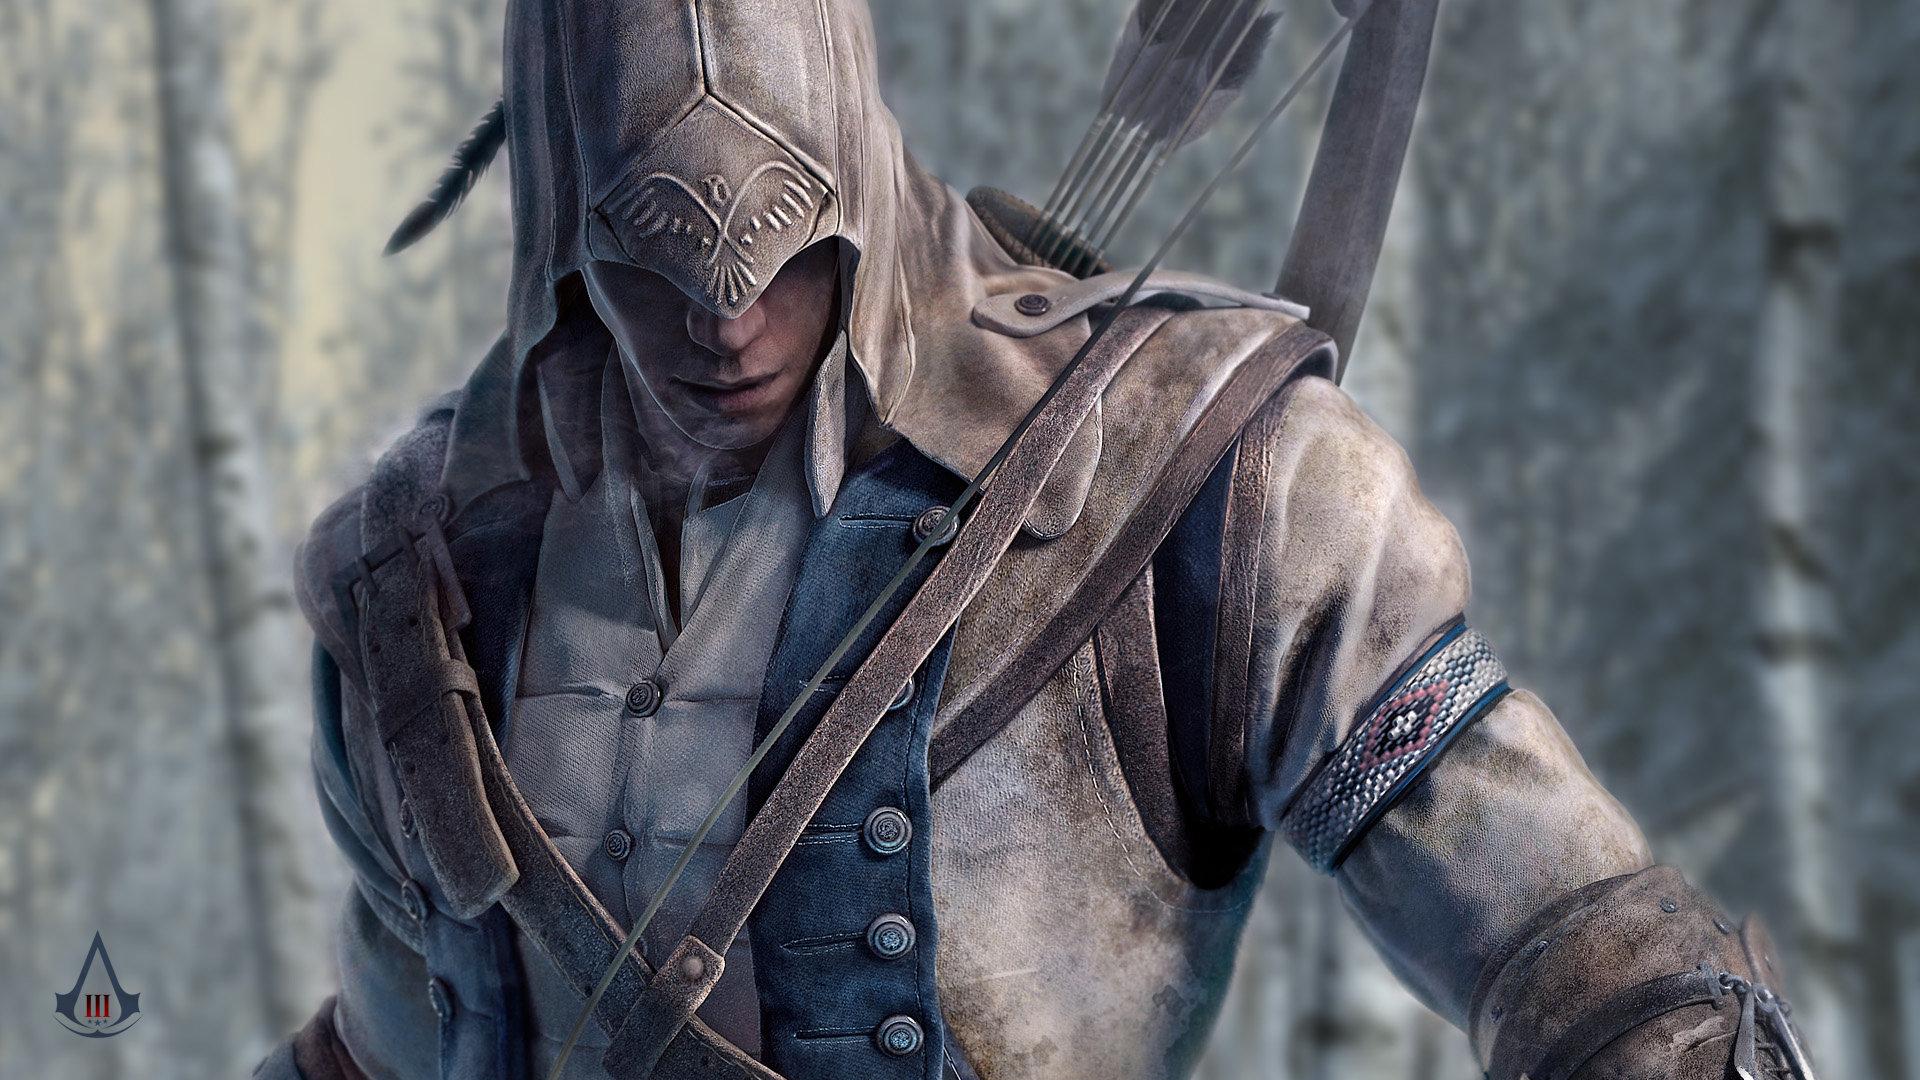 Assassin S Creed 3 Wallpapers 1920x1080 Full Hd 1080p Desktop